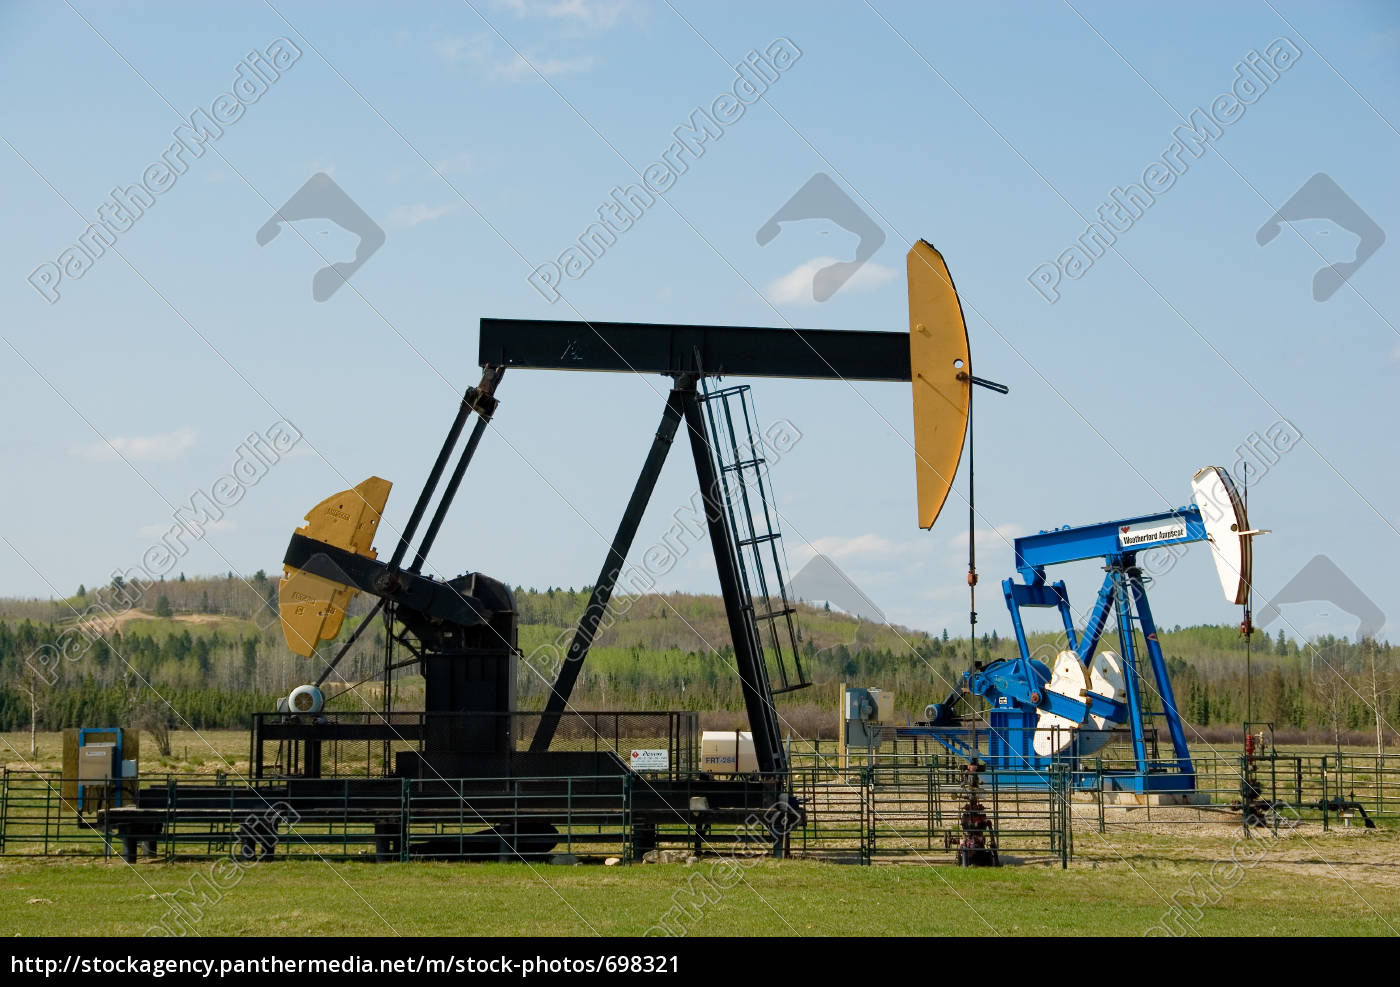 energy, pumps - 698321